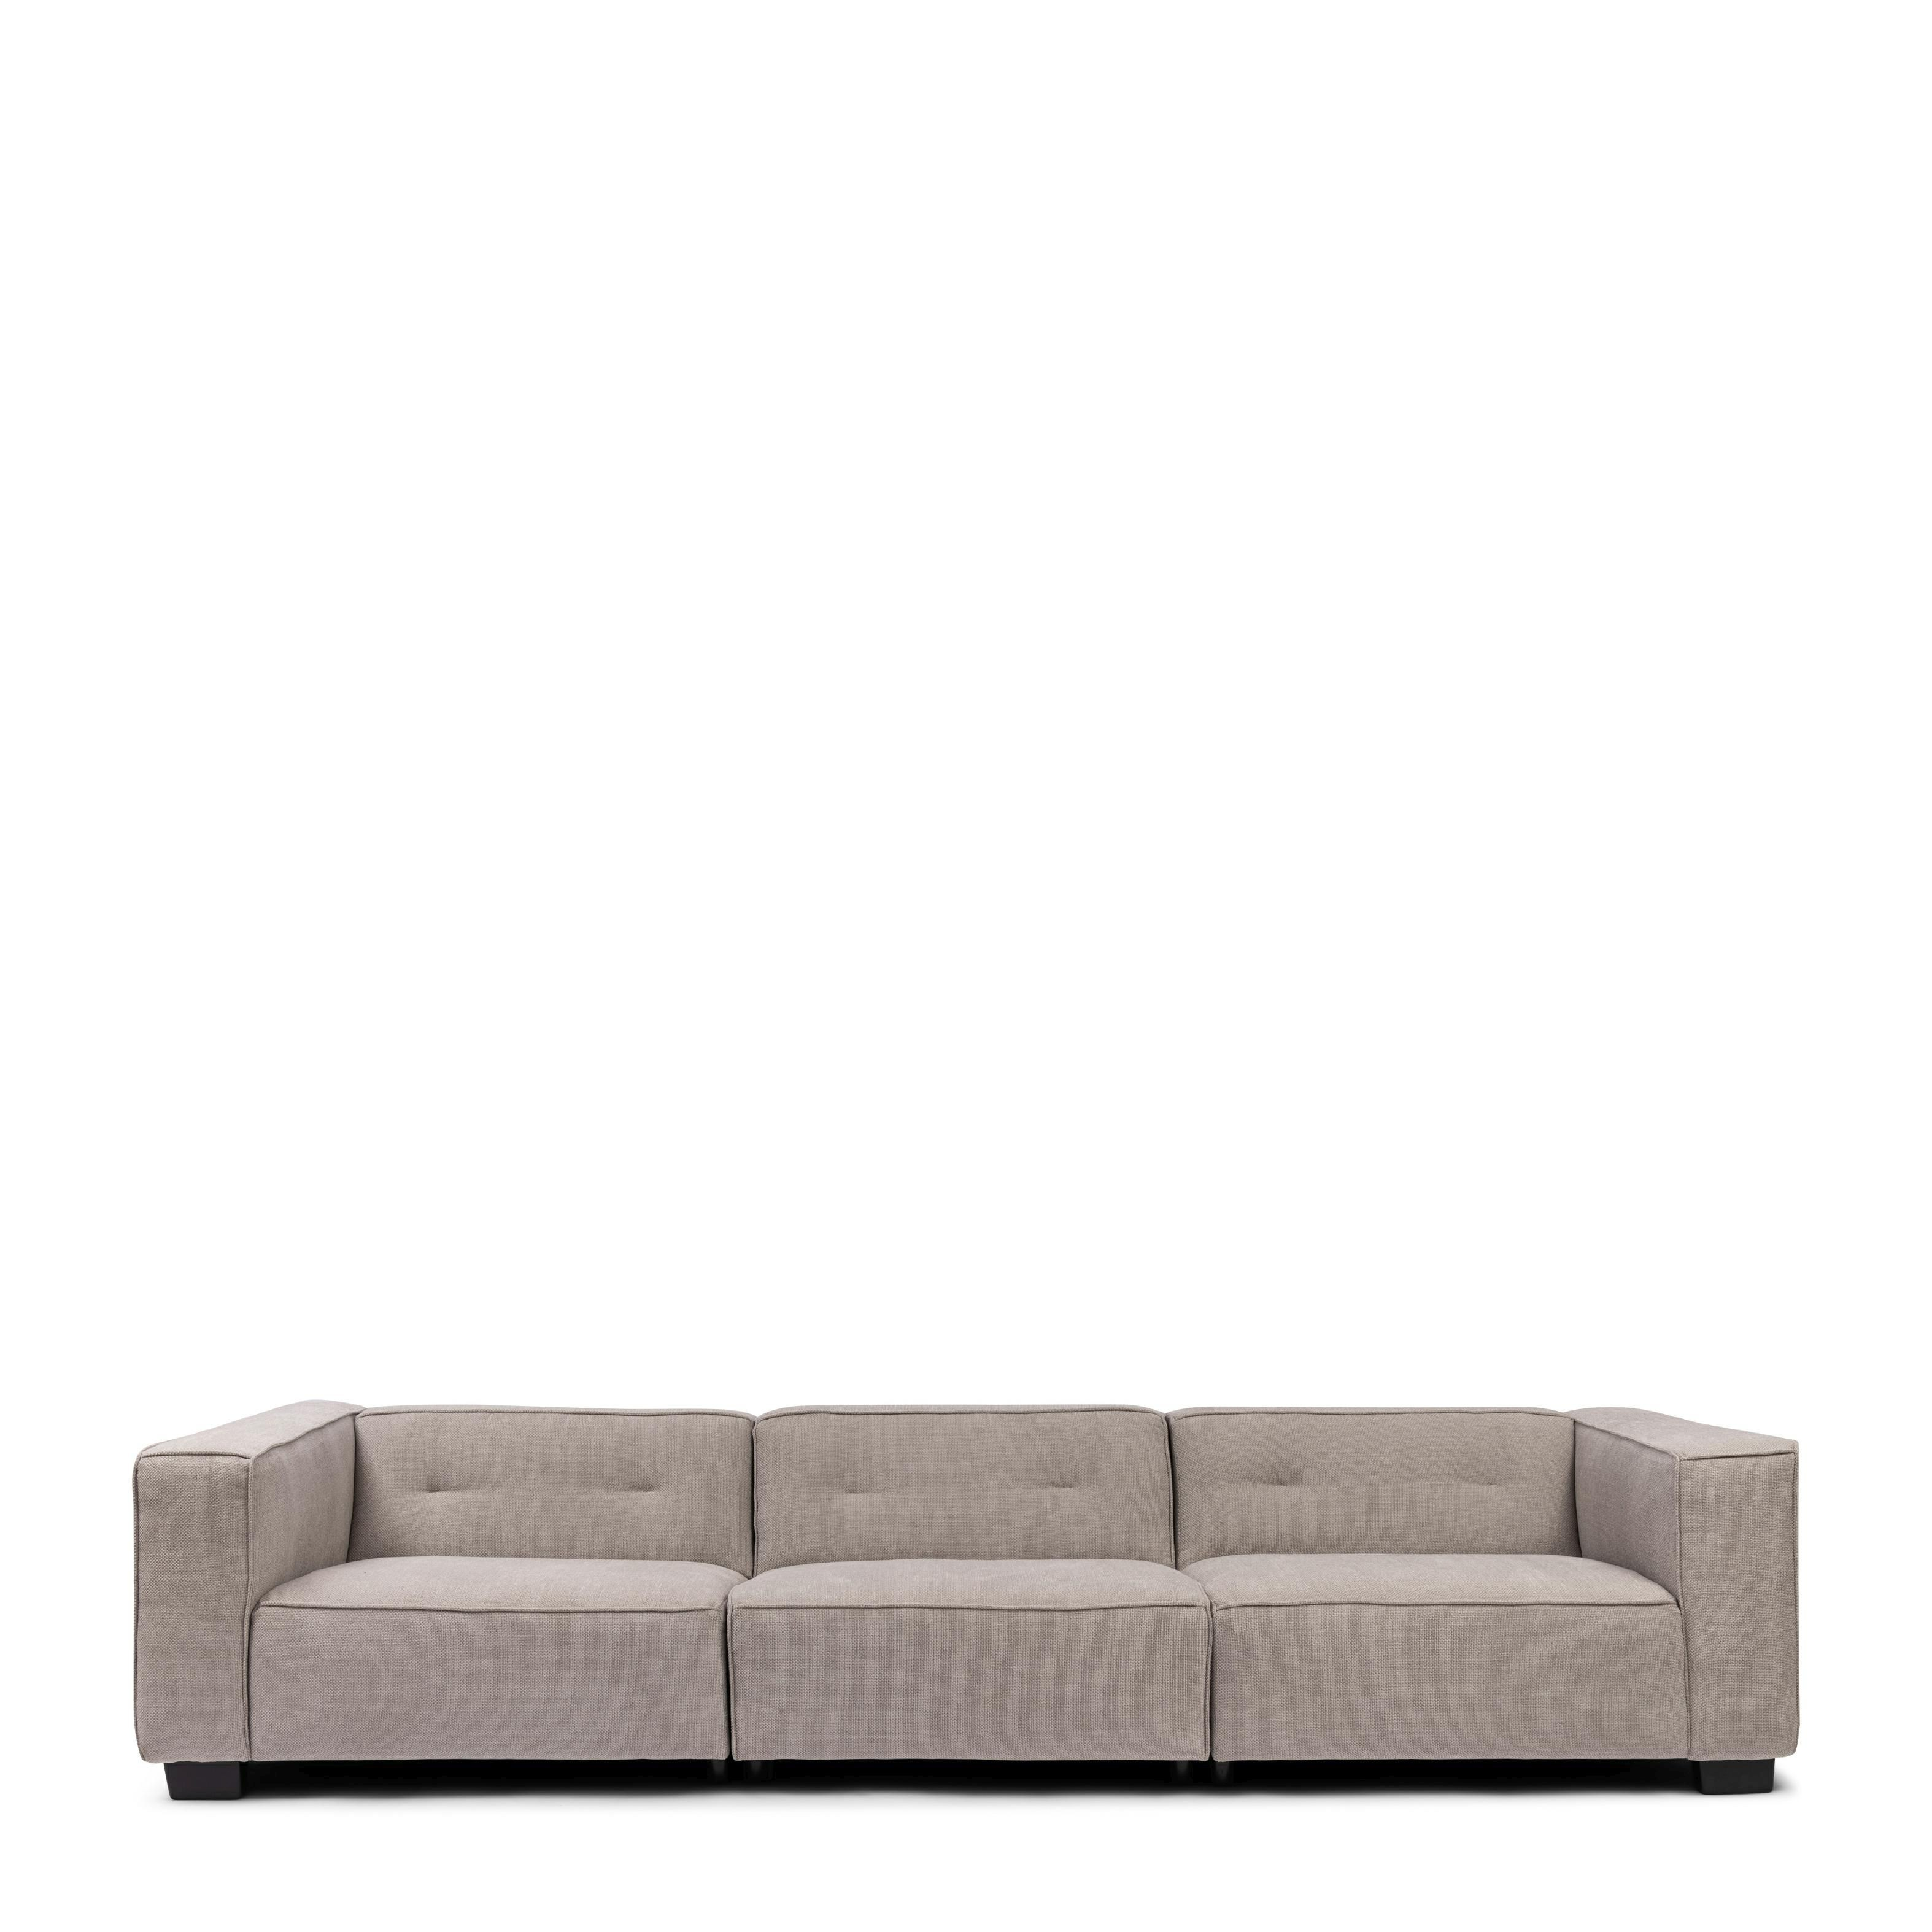 Hampton Heights Sofa XL washed cotton ash grey / Rivièra Maison